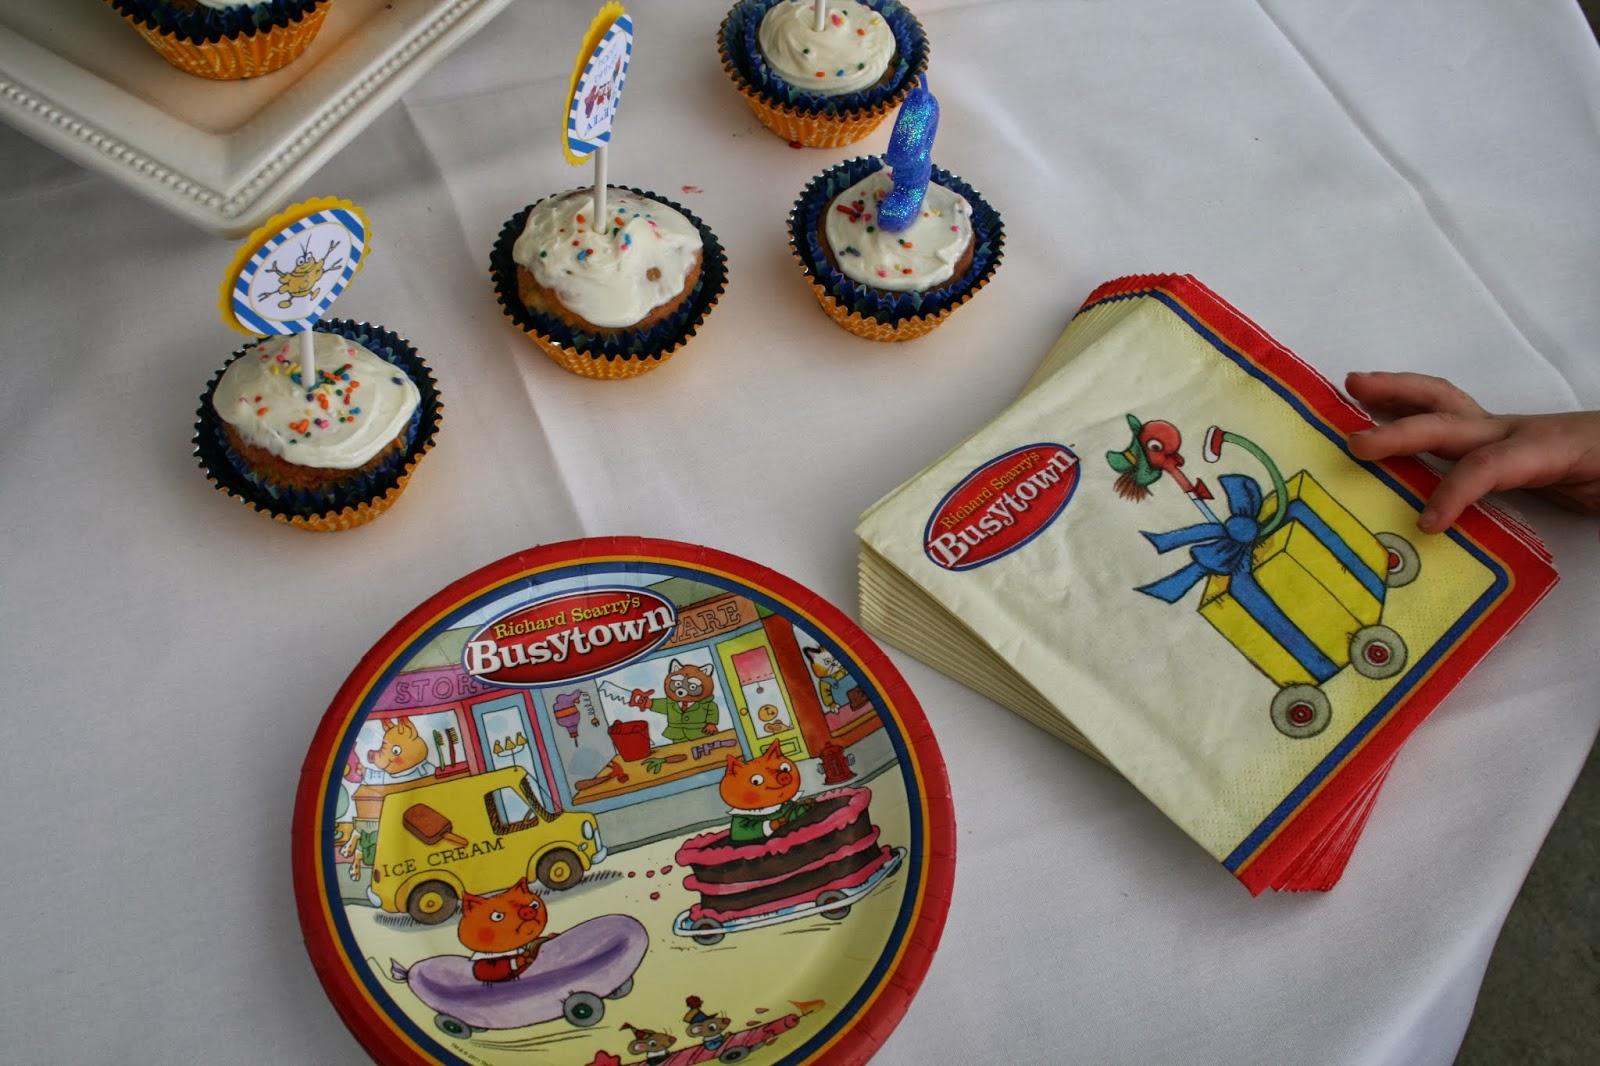 Birthday Party Ideas Richmond Va Image Inspiration of Cake and